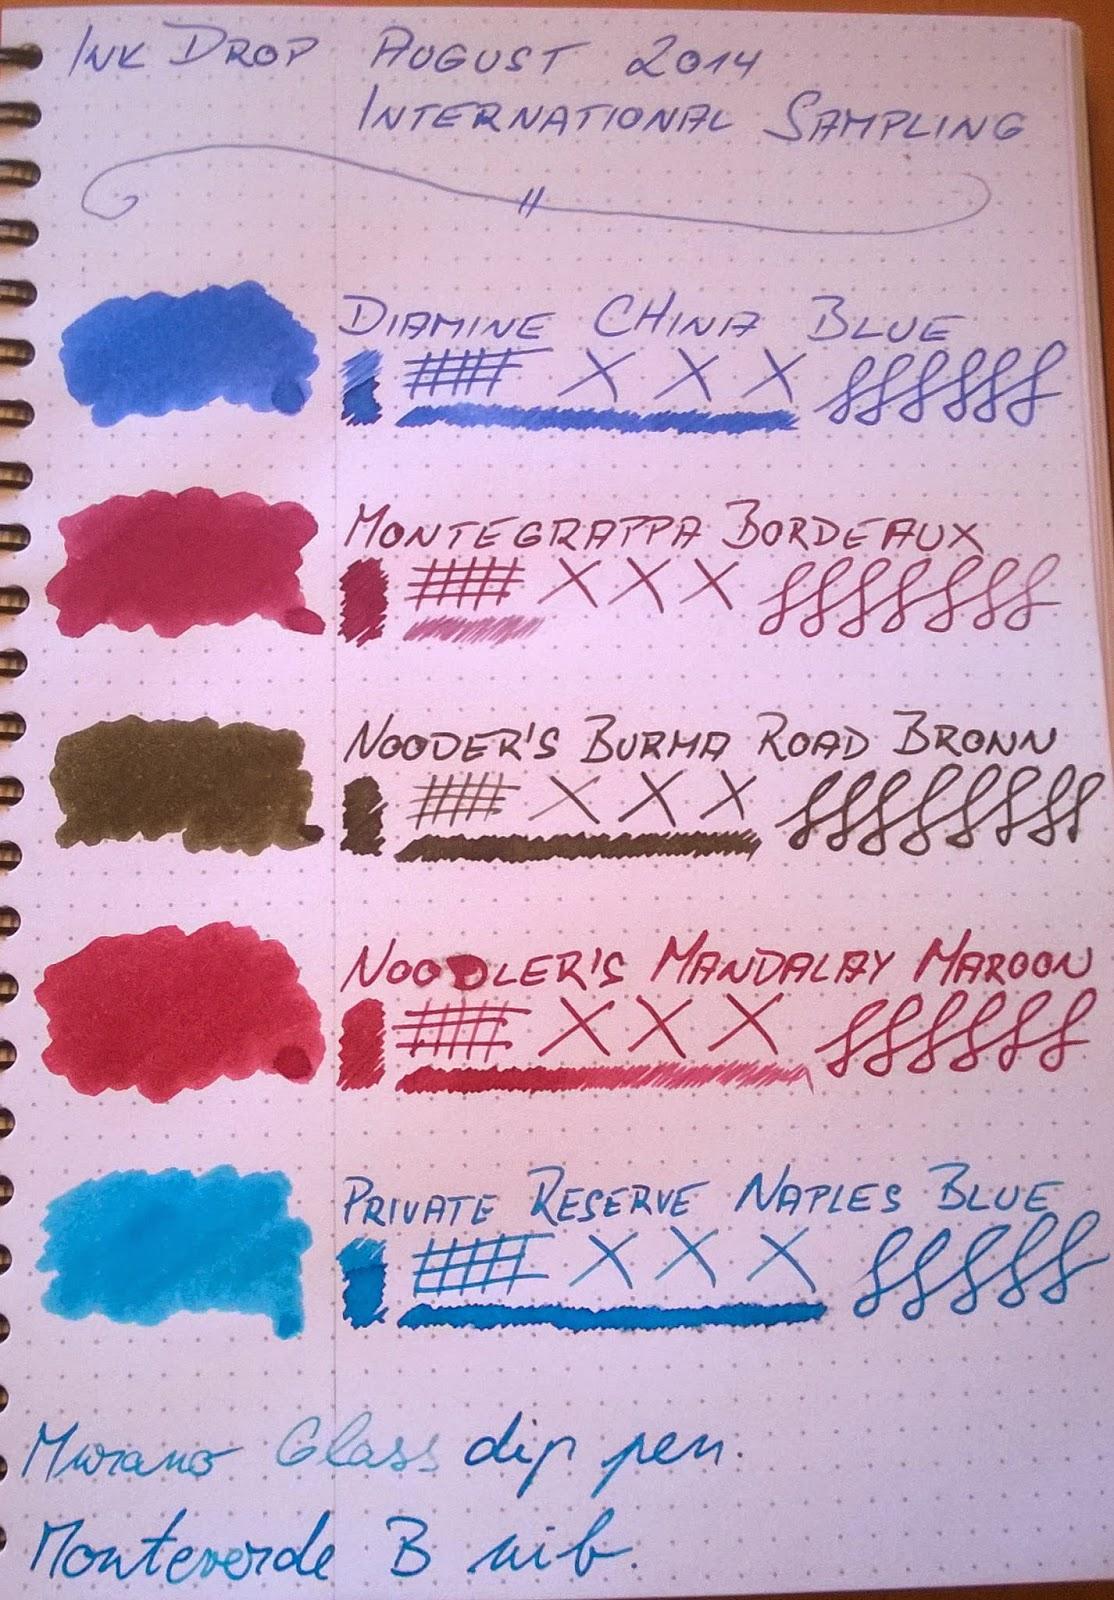 Ink Drop August 2014: International Sampling